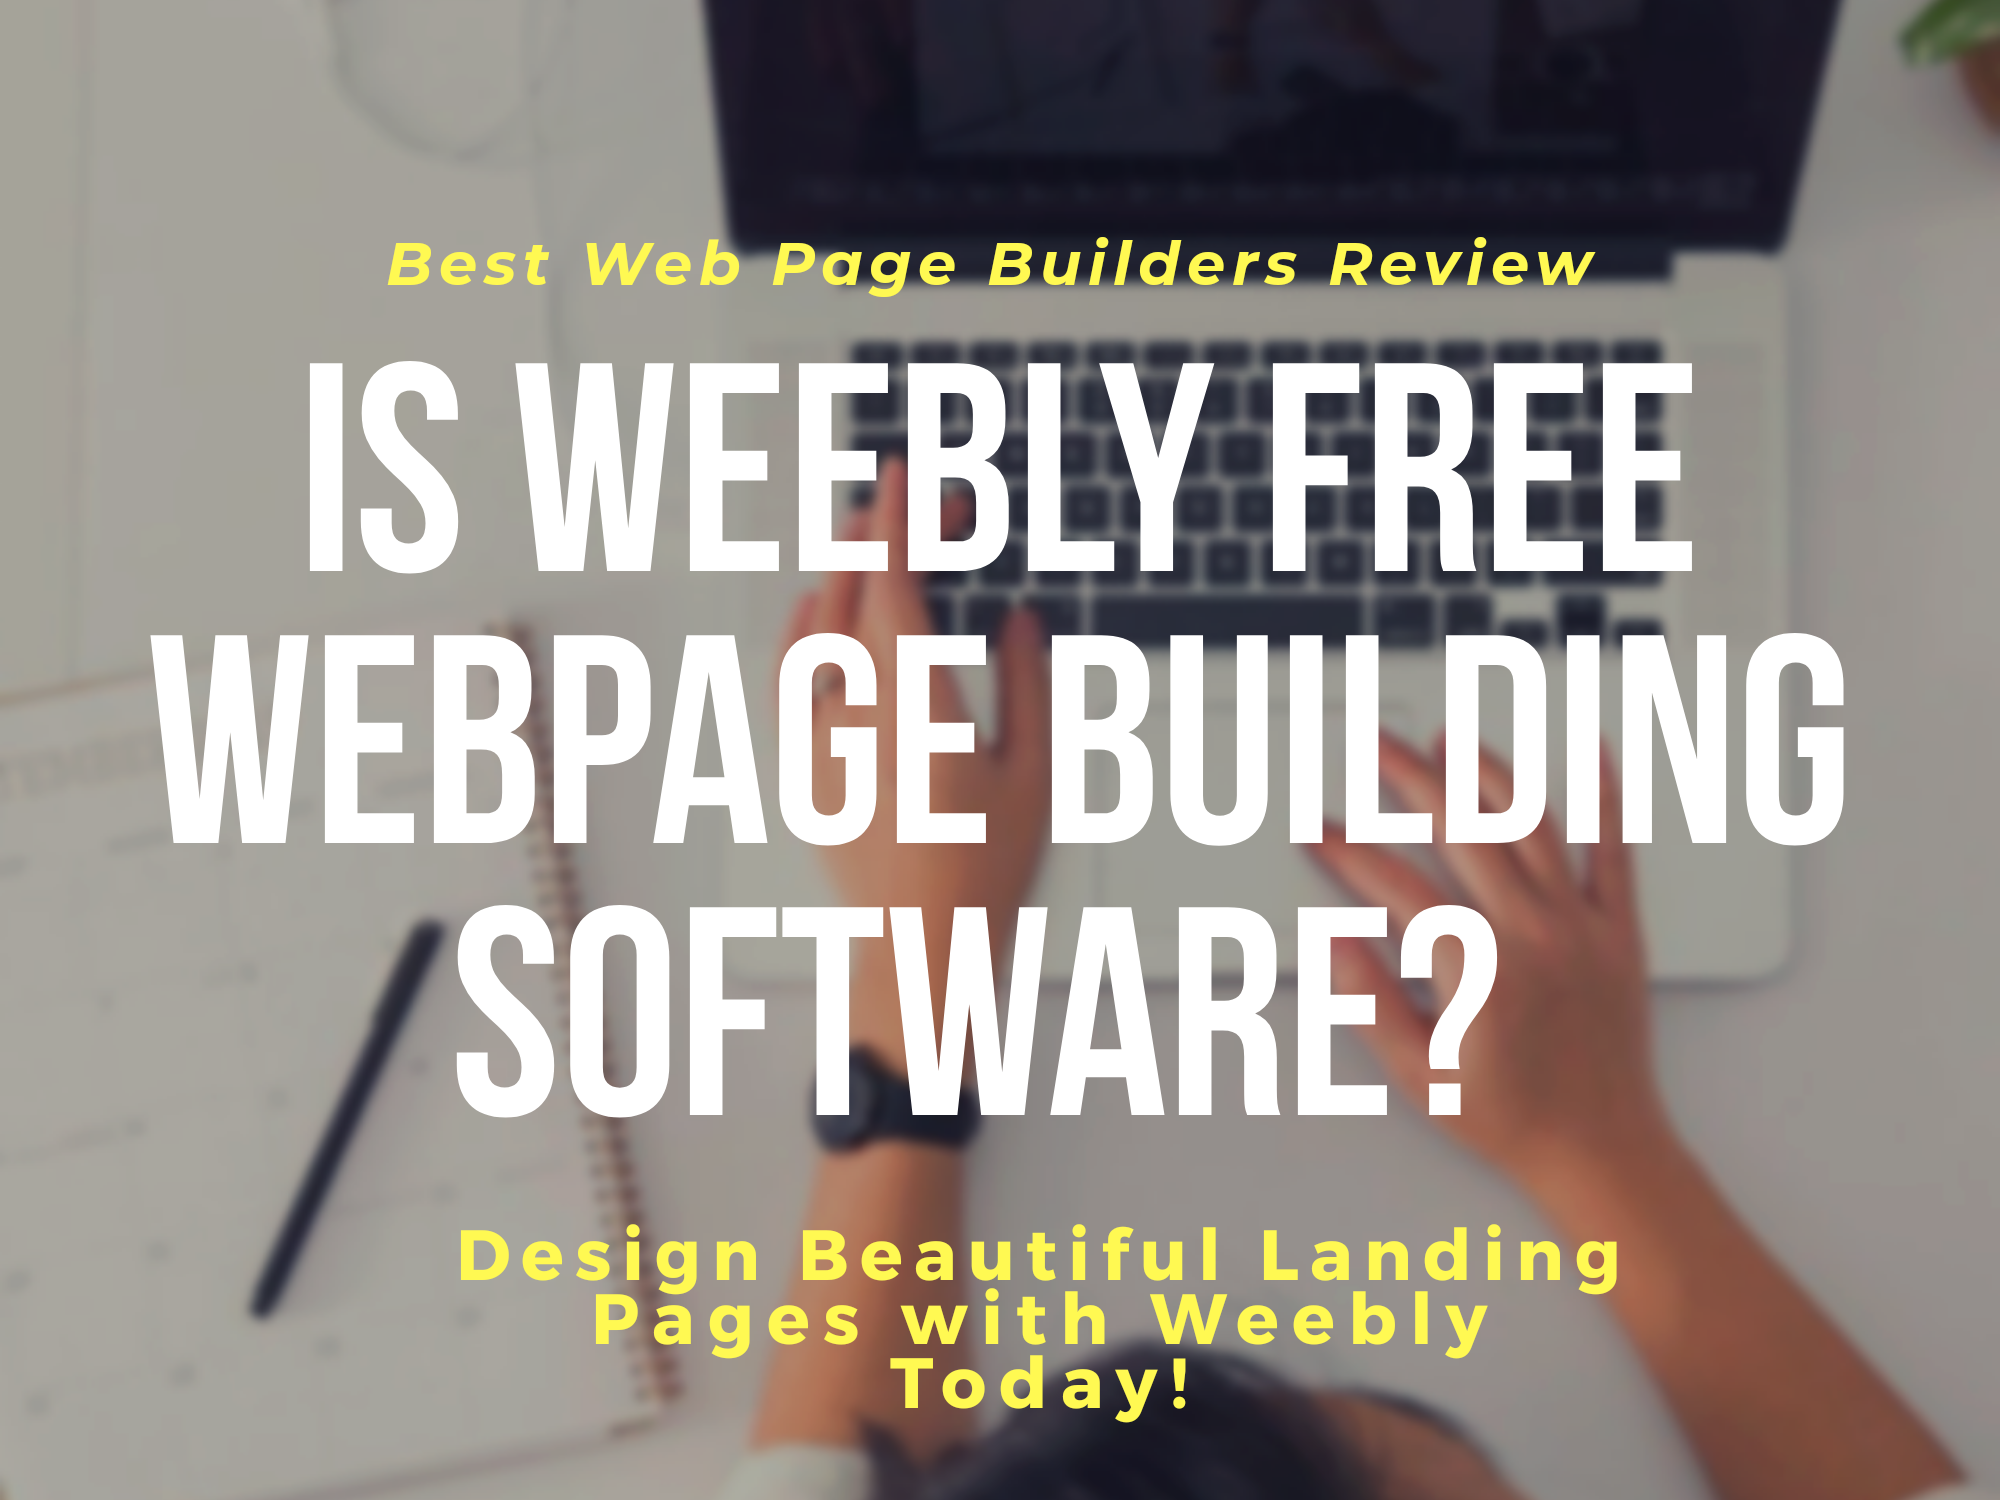 Best Free Webpage Building Software